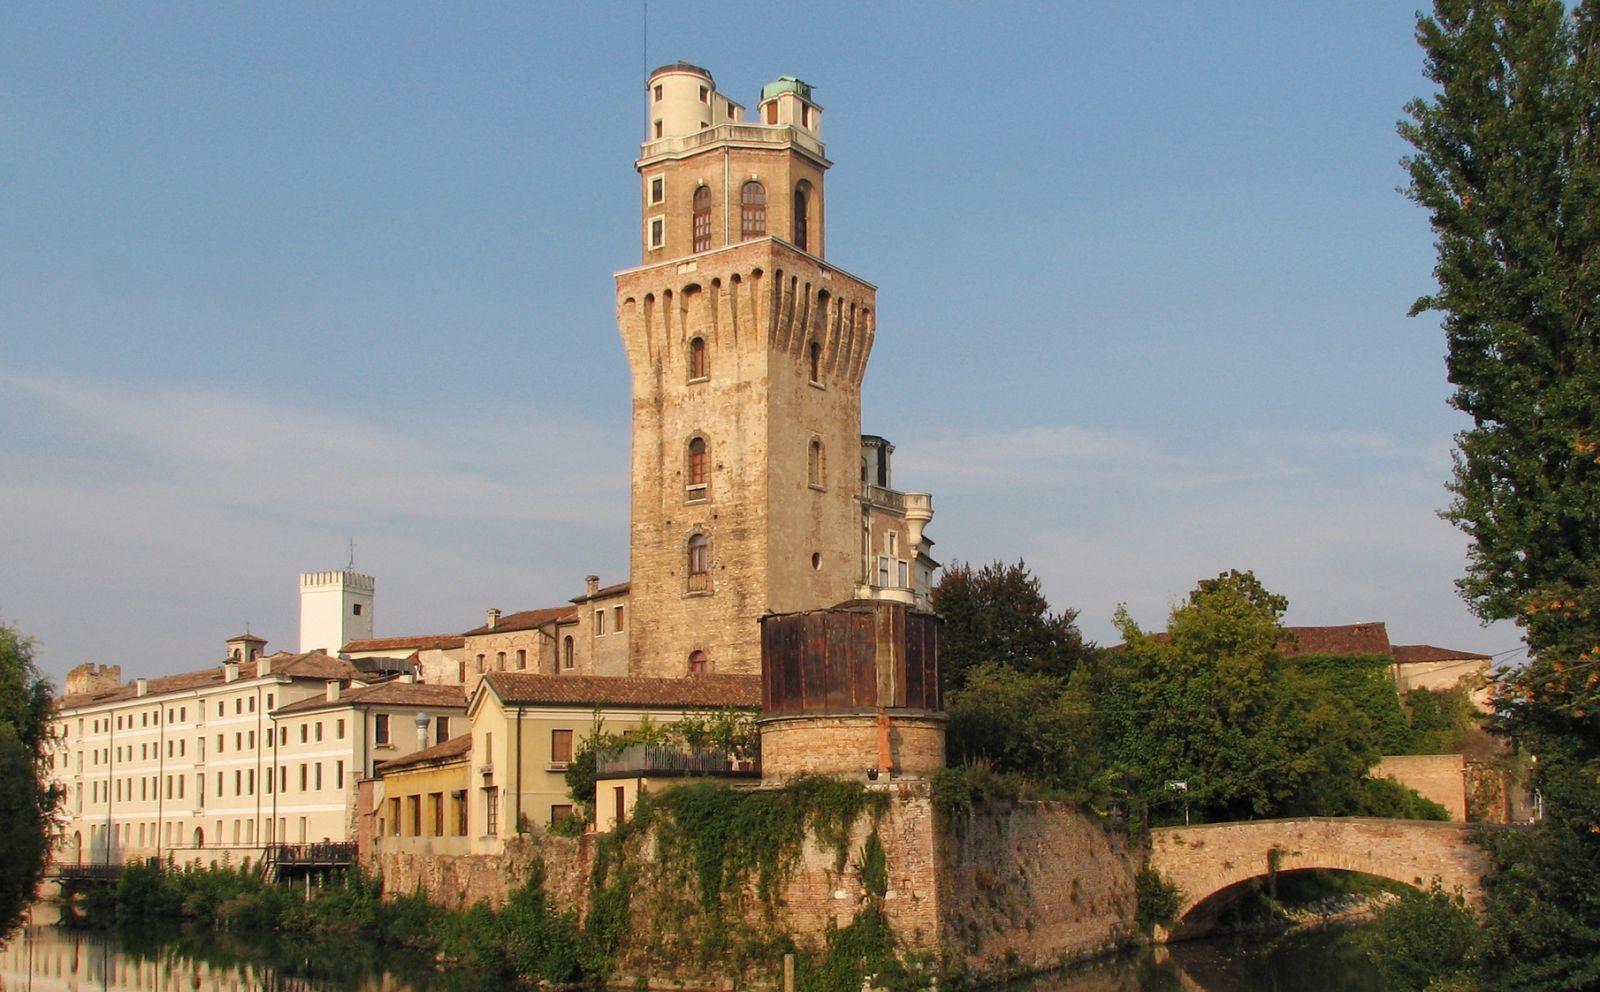 Osservatorio Astrologico la Specola a Padova